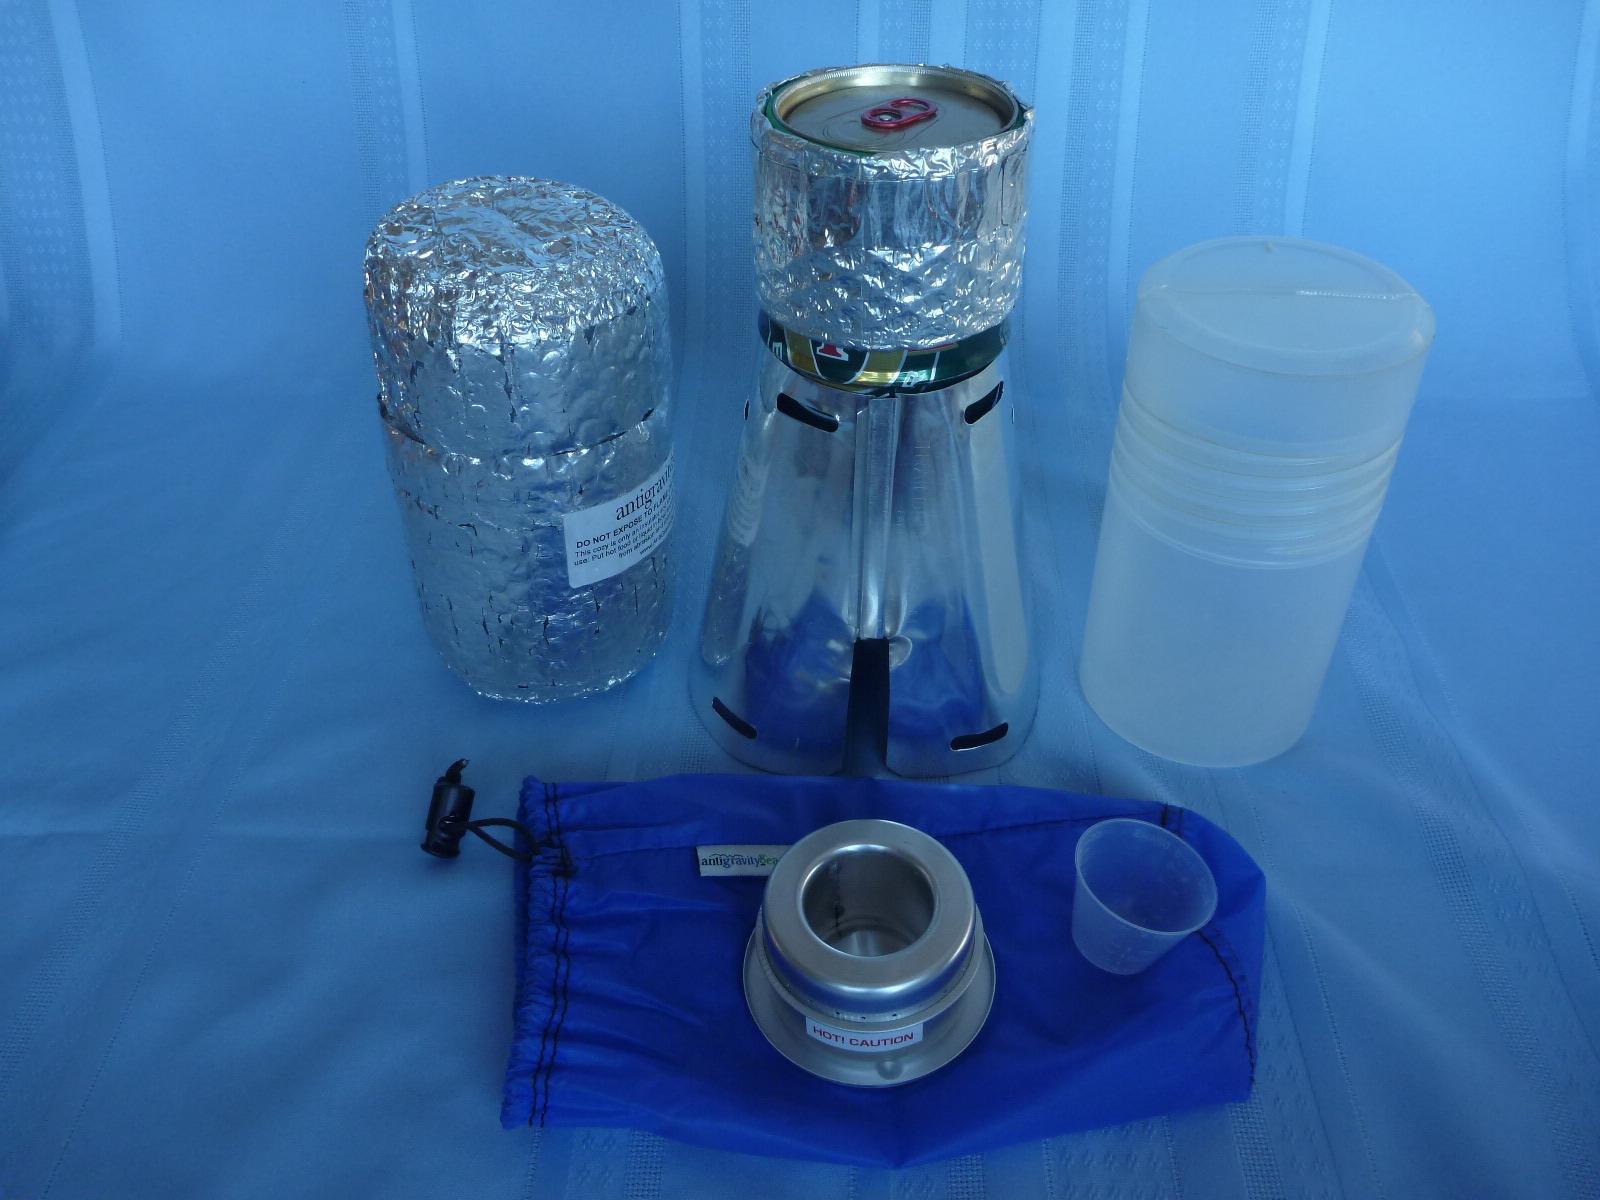 Fs Antigravitygear Ul Cooking System Similar To Trail Designs Caldera Keg F Backpacking Light